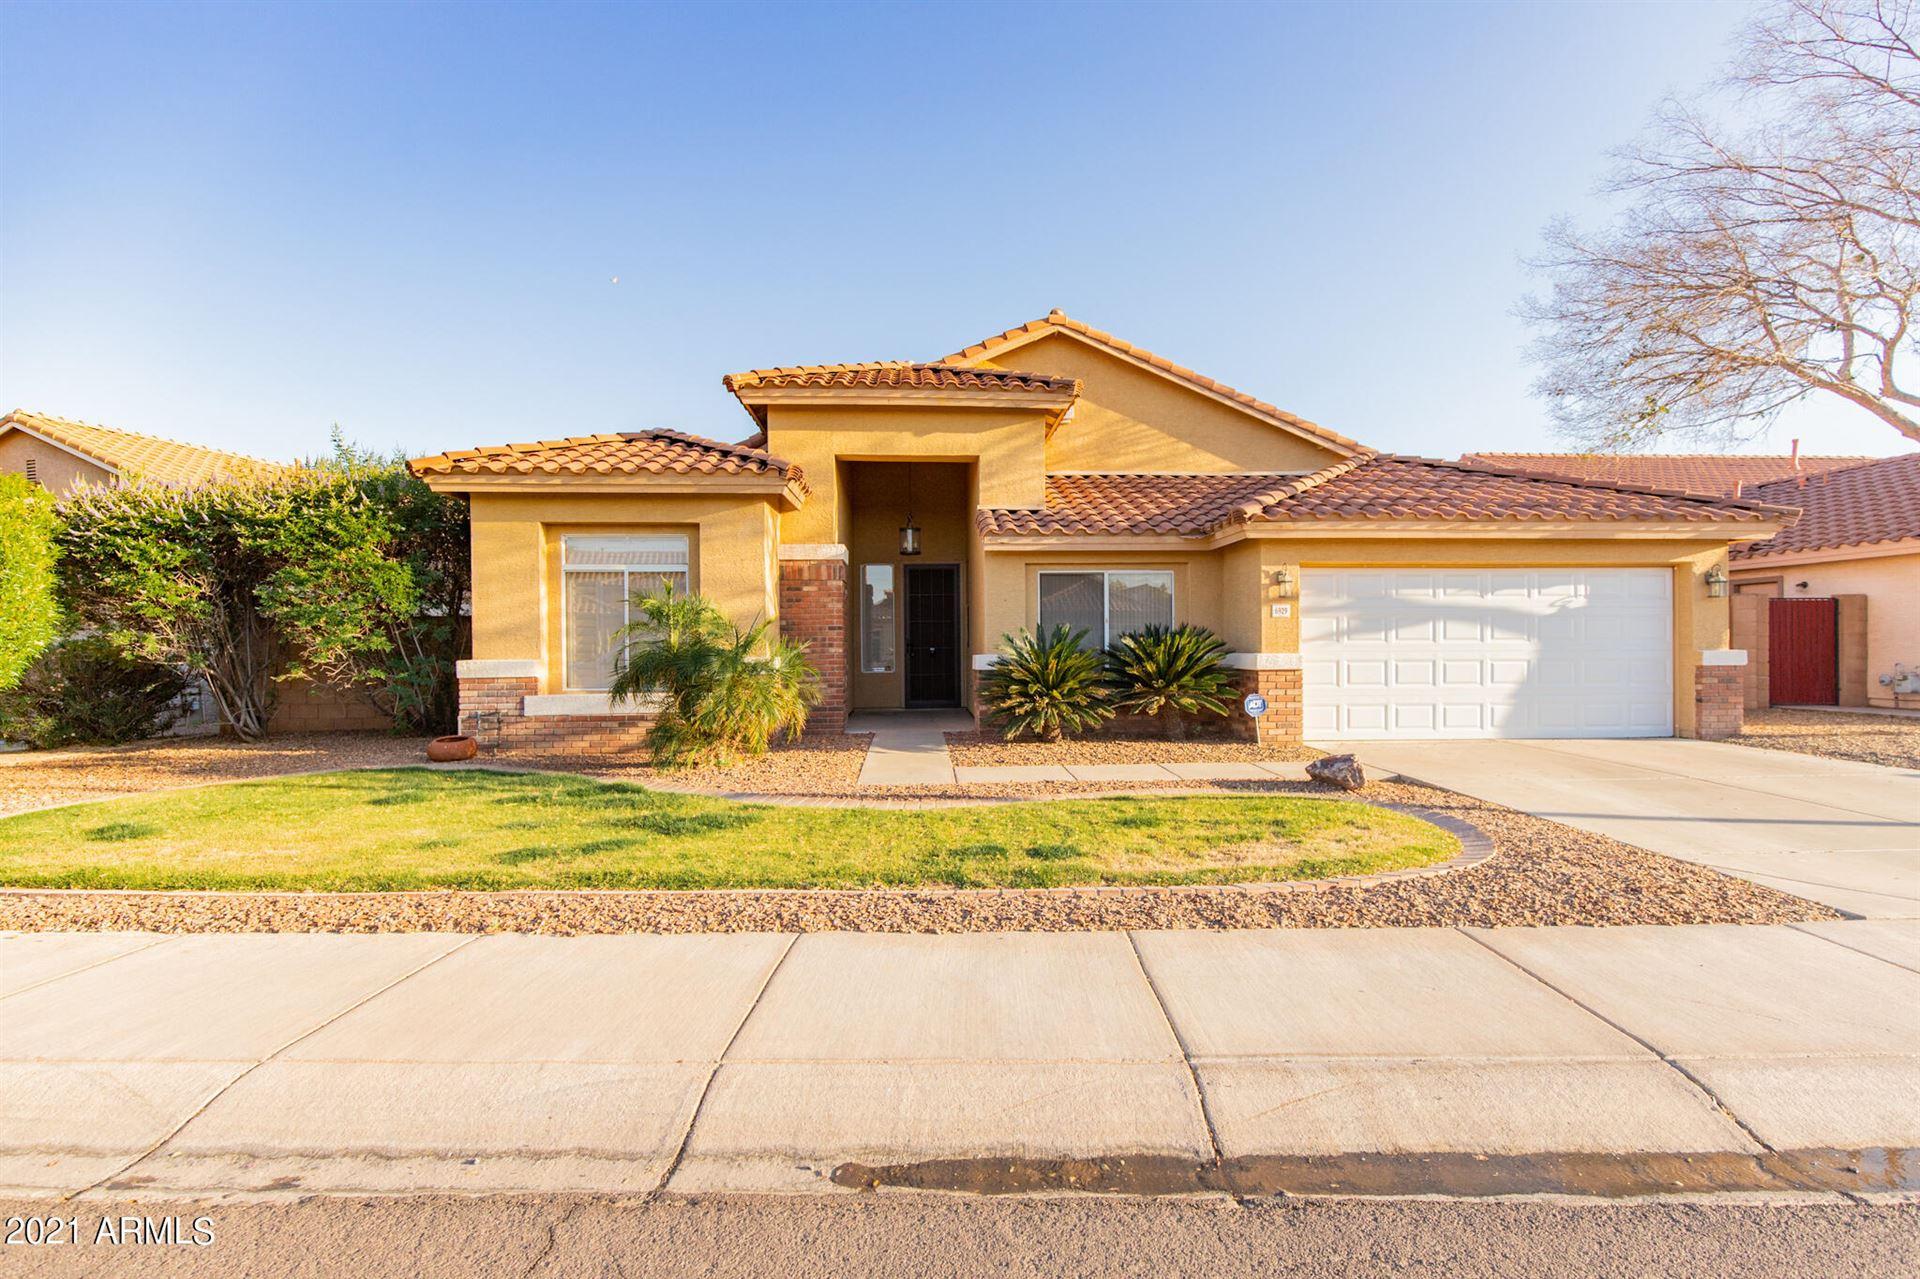 Photo of 6929 W MONTEREY Street, Chandler, AZ 85226 (MLS # 6233887)